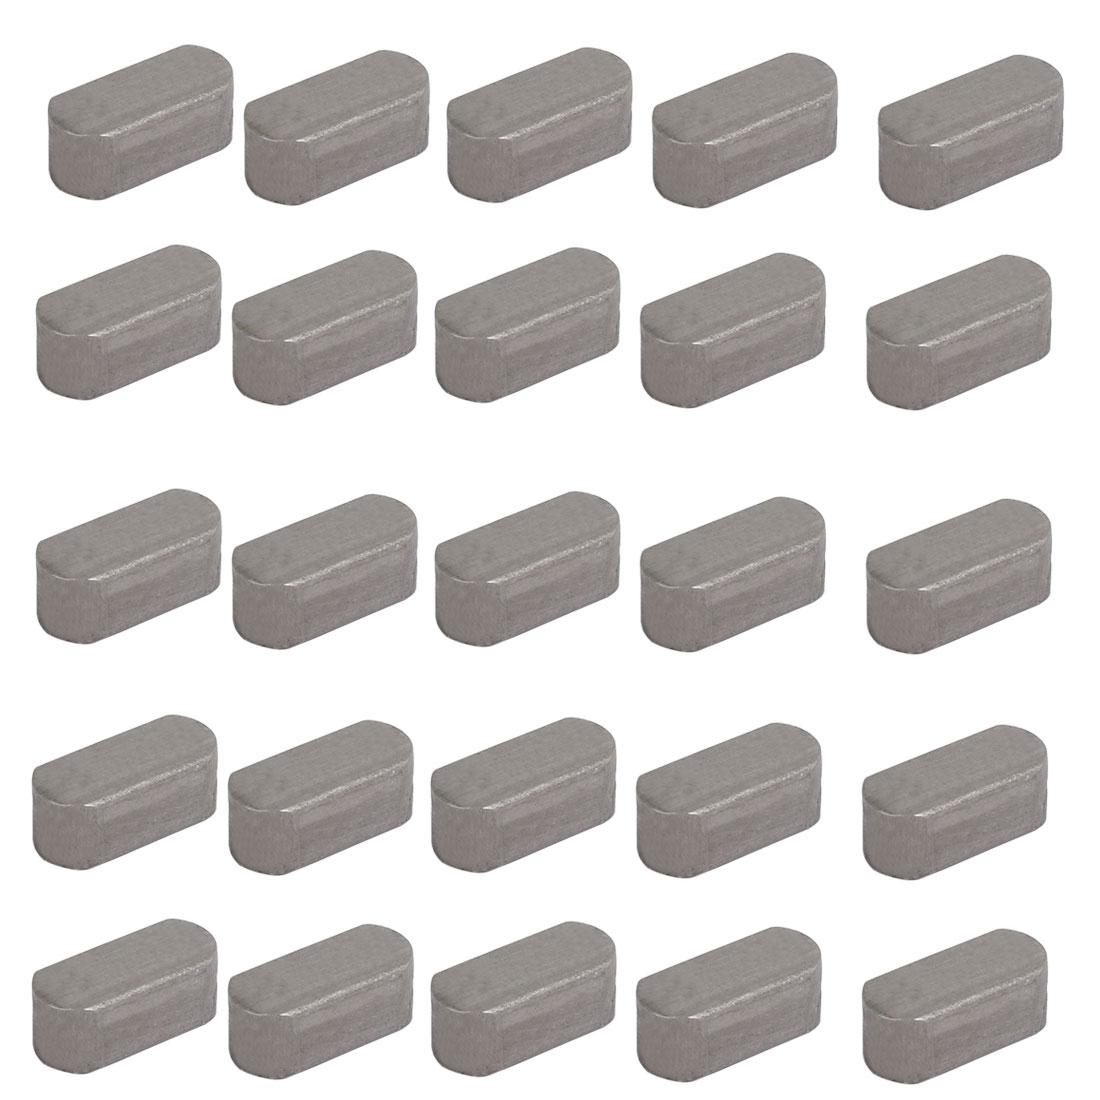 18mmx8mmx7mm Carbon Steel Key Stock To Lock Pulleys 25pcs